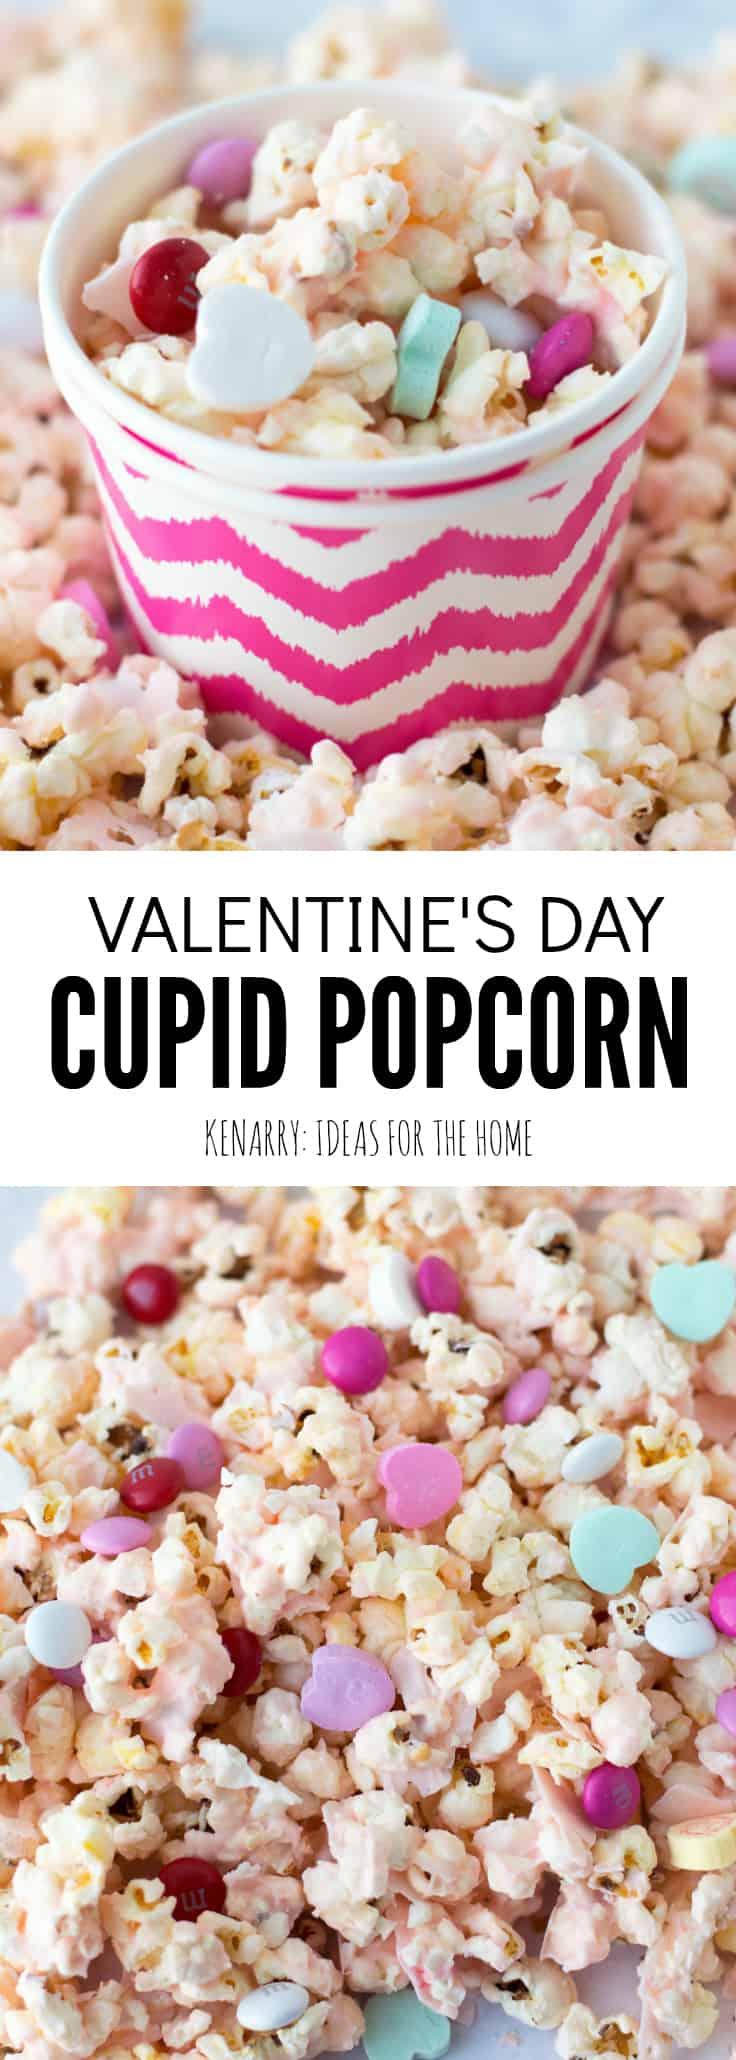 Cupid Popcorn Easy Valentine S Day Recipe And Treat Idea